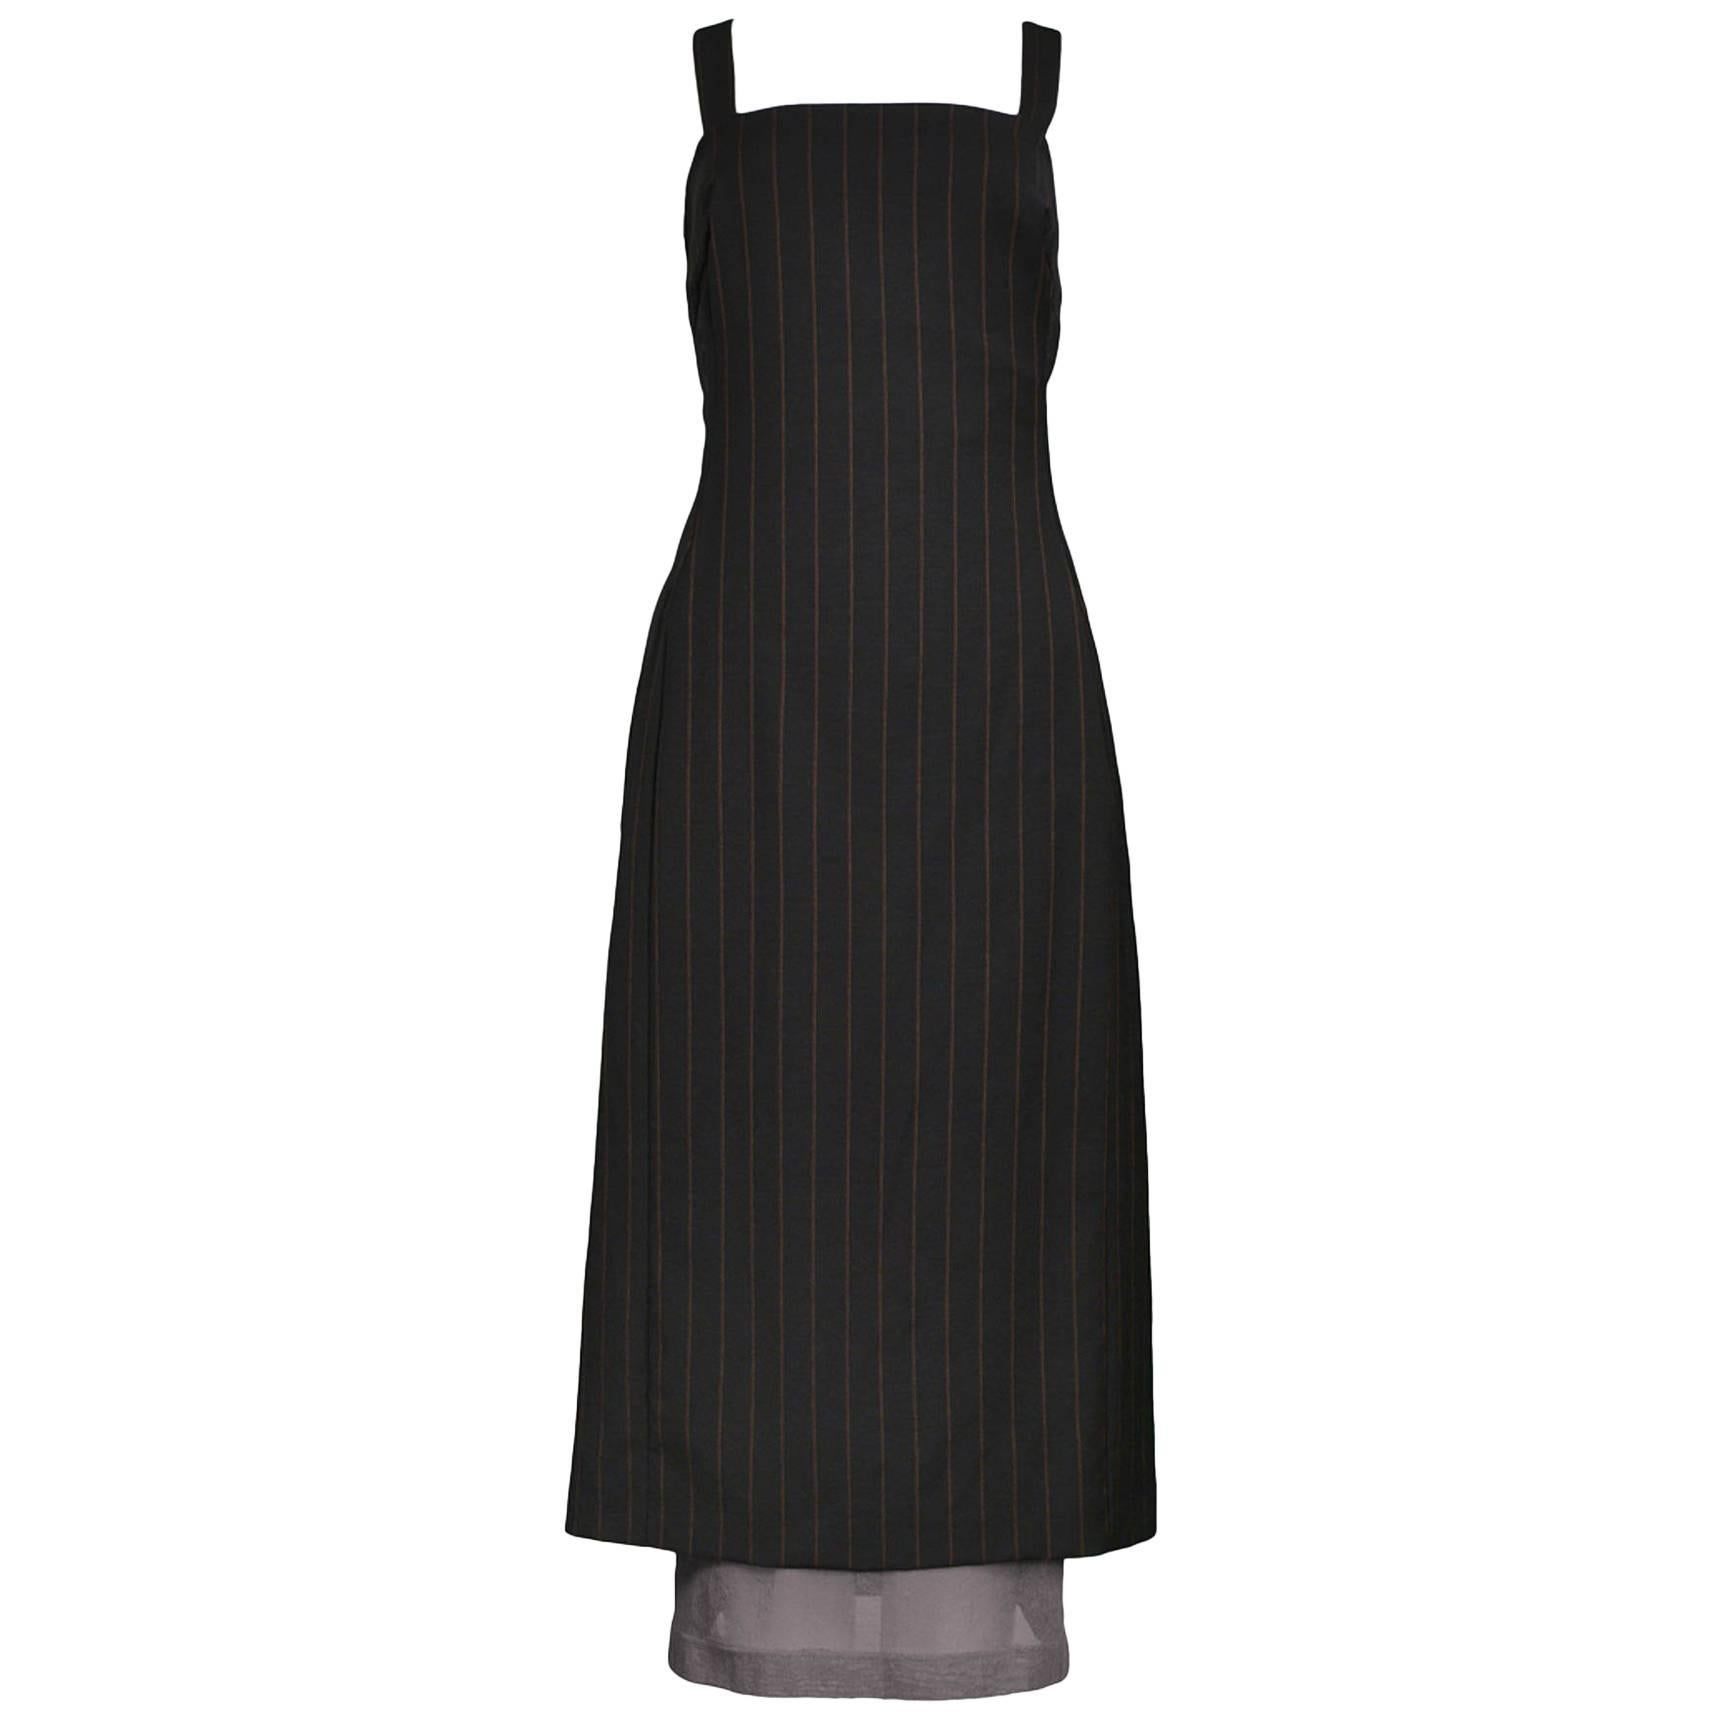 Vintage Dolce & Gabbana Double Layer Pinstripe Dress